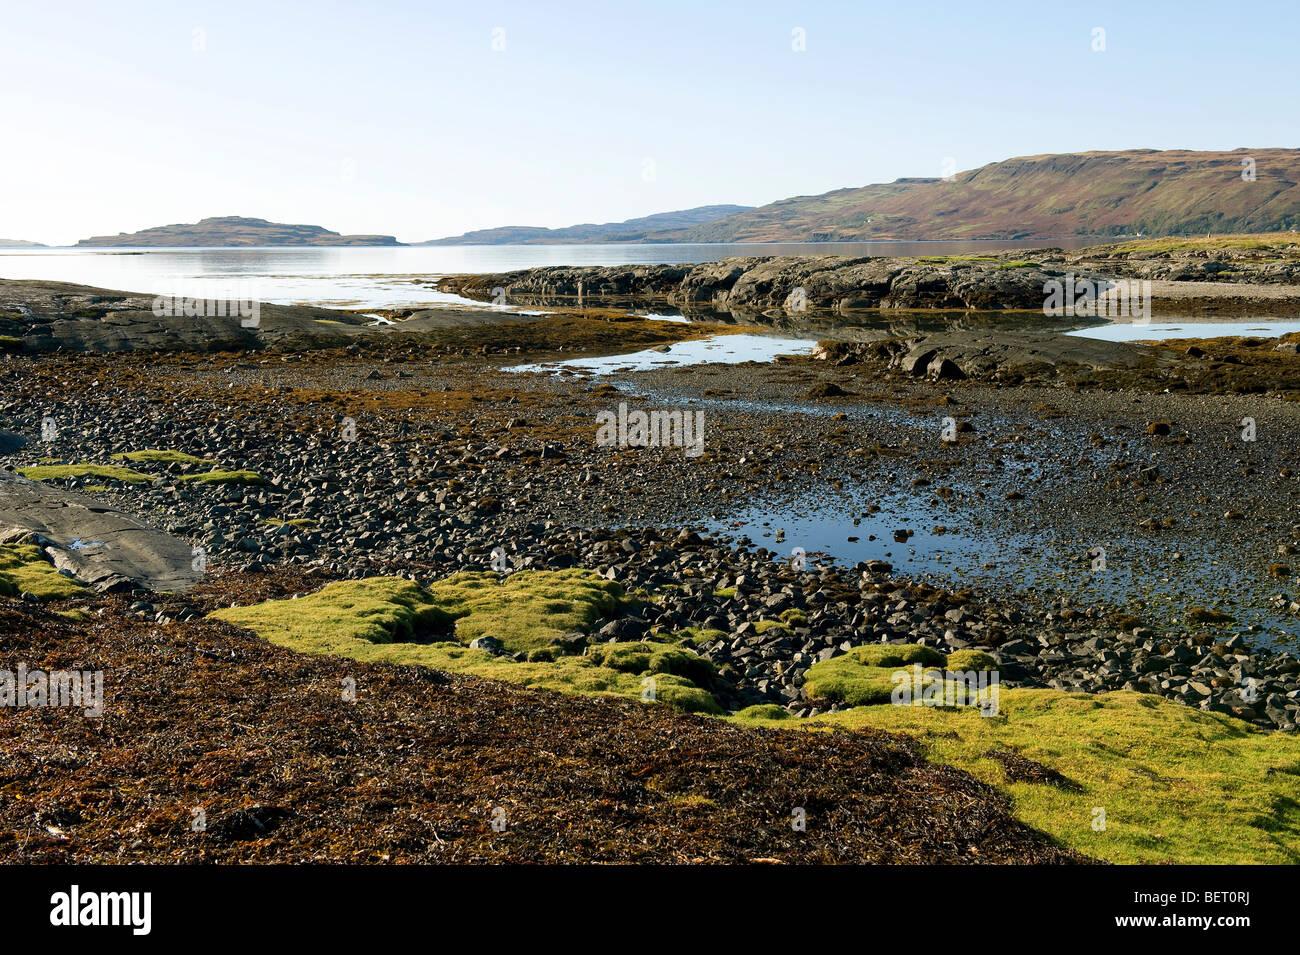 loch na keal, isle of mull, scotland - Stock Image